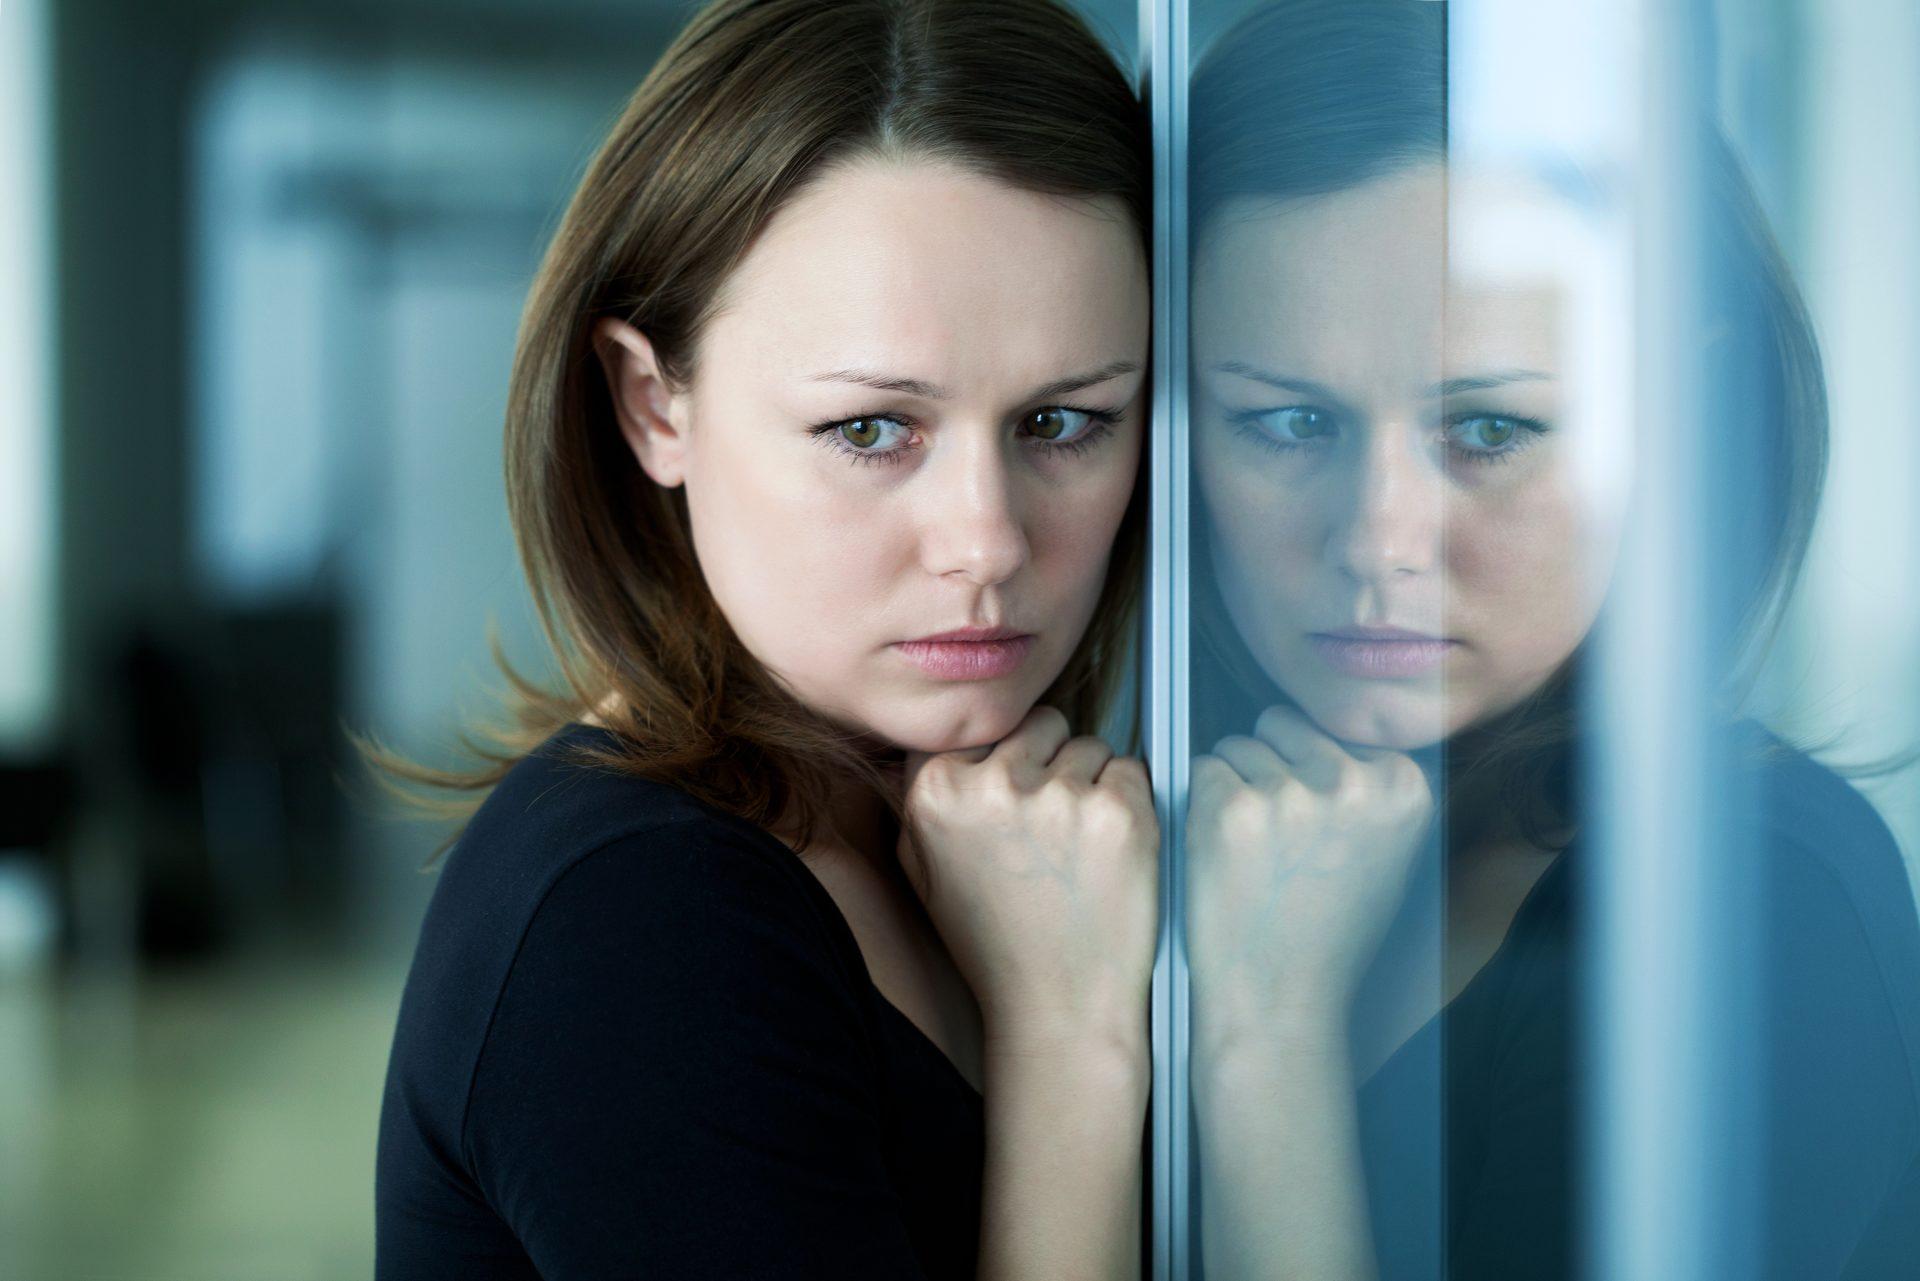 Realizing Self: Finding Hidden Potentials